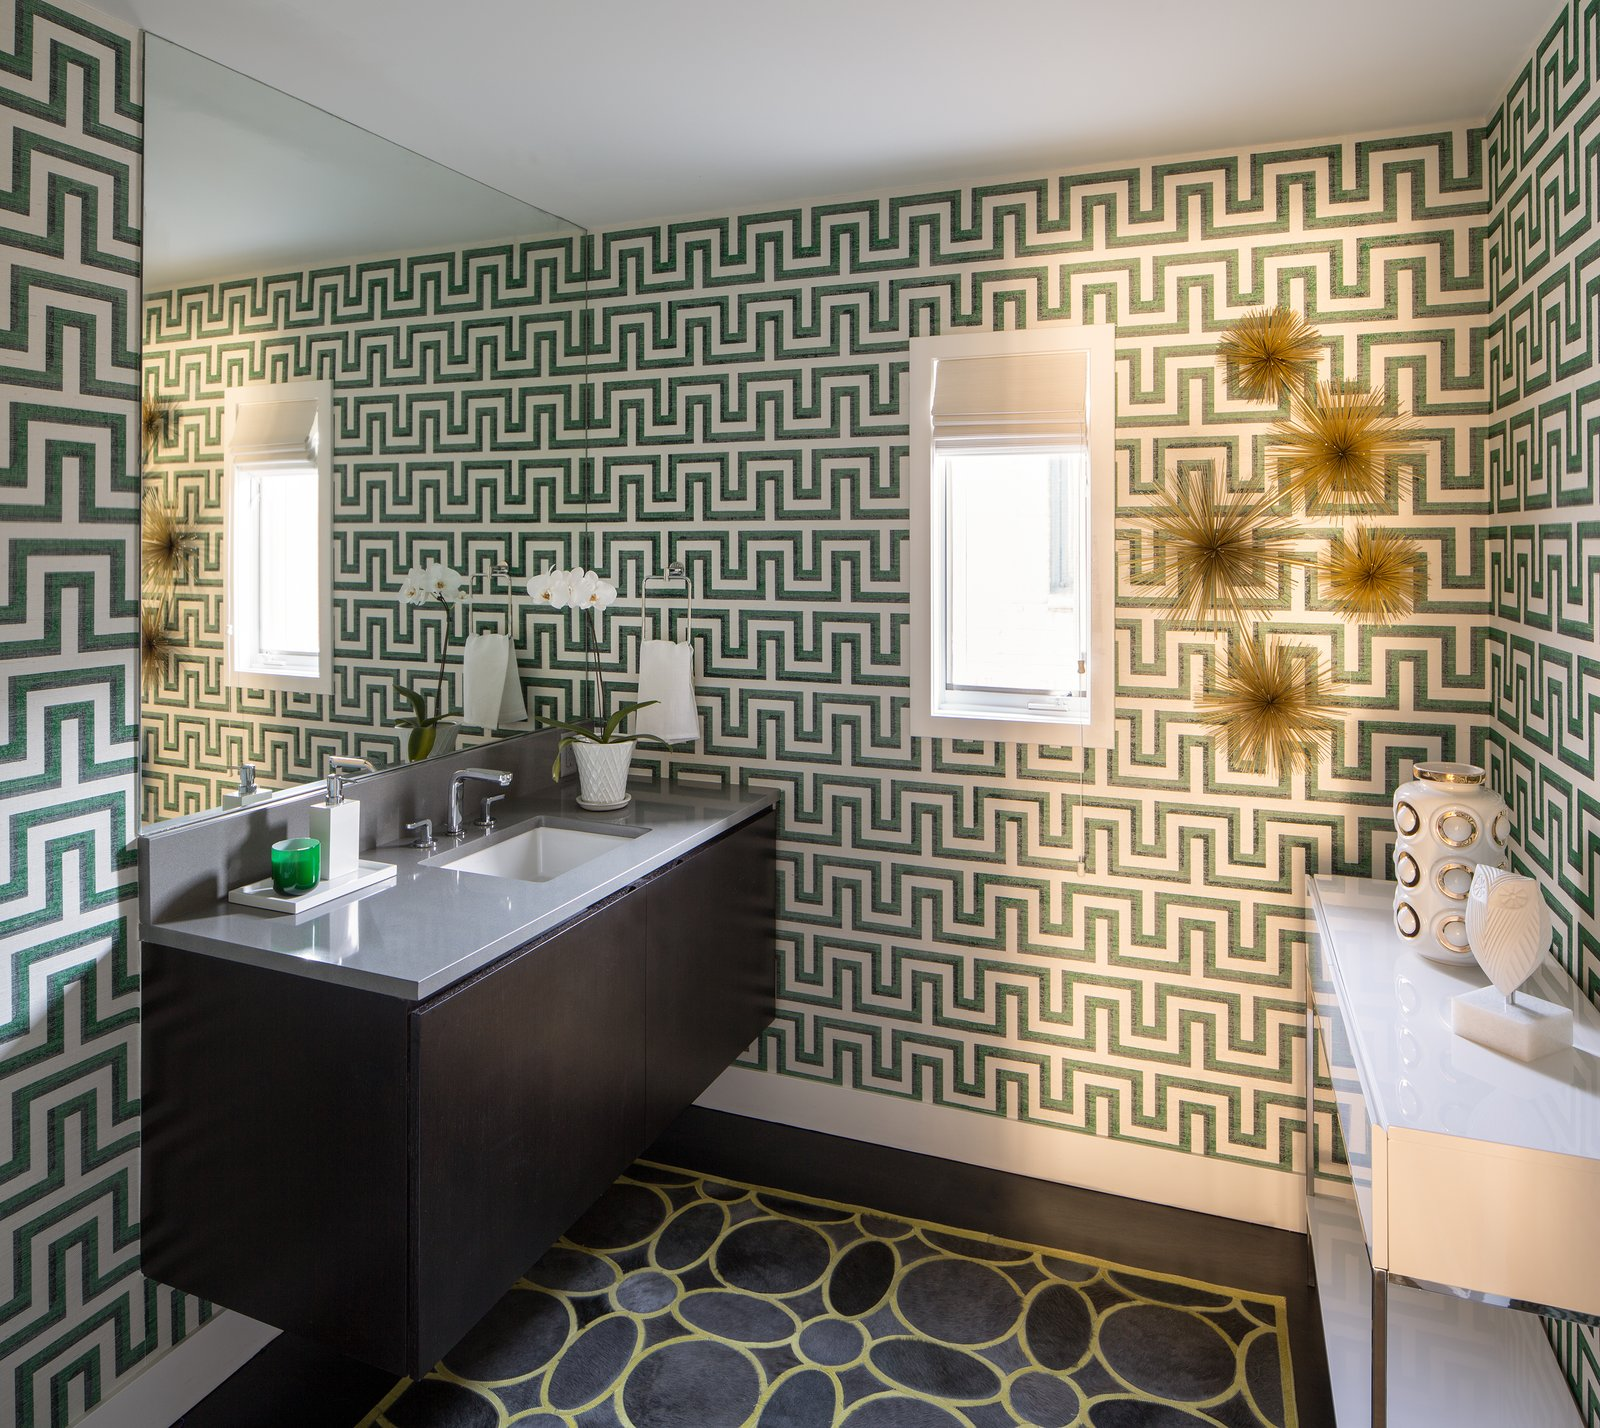 Bath Room, Engineered Quartz Counter, Dark Hardwood Floor, Undermount Sink, and Ceiling Lighting Powder Room  Donner Residence by Design Platform